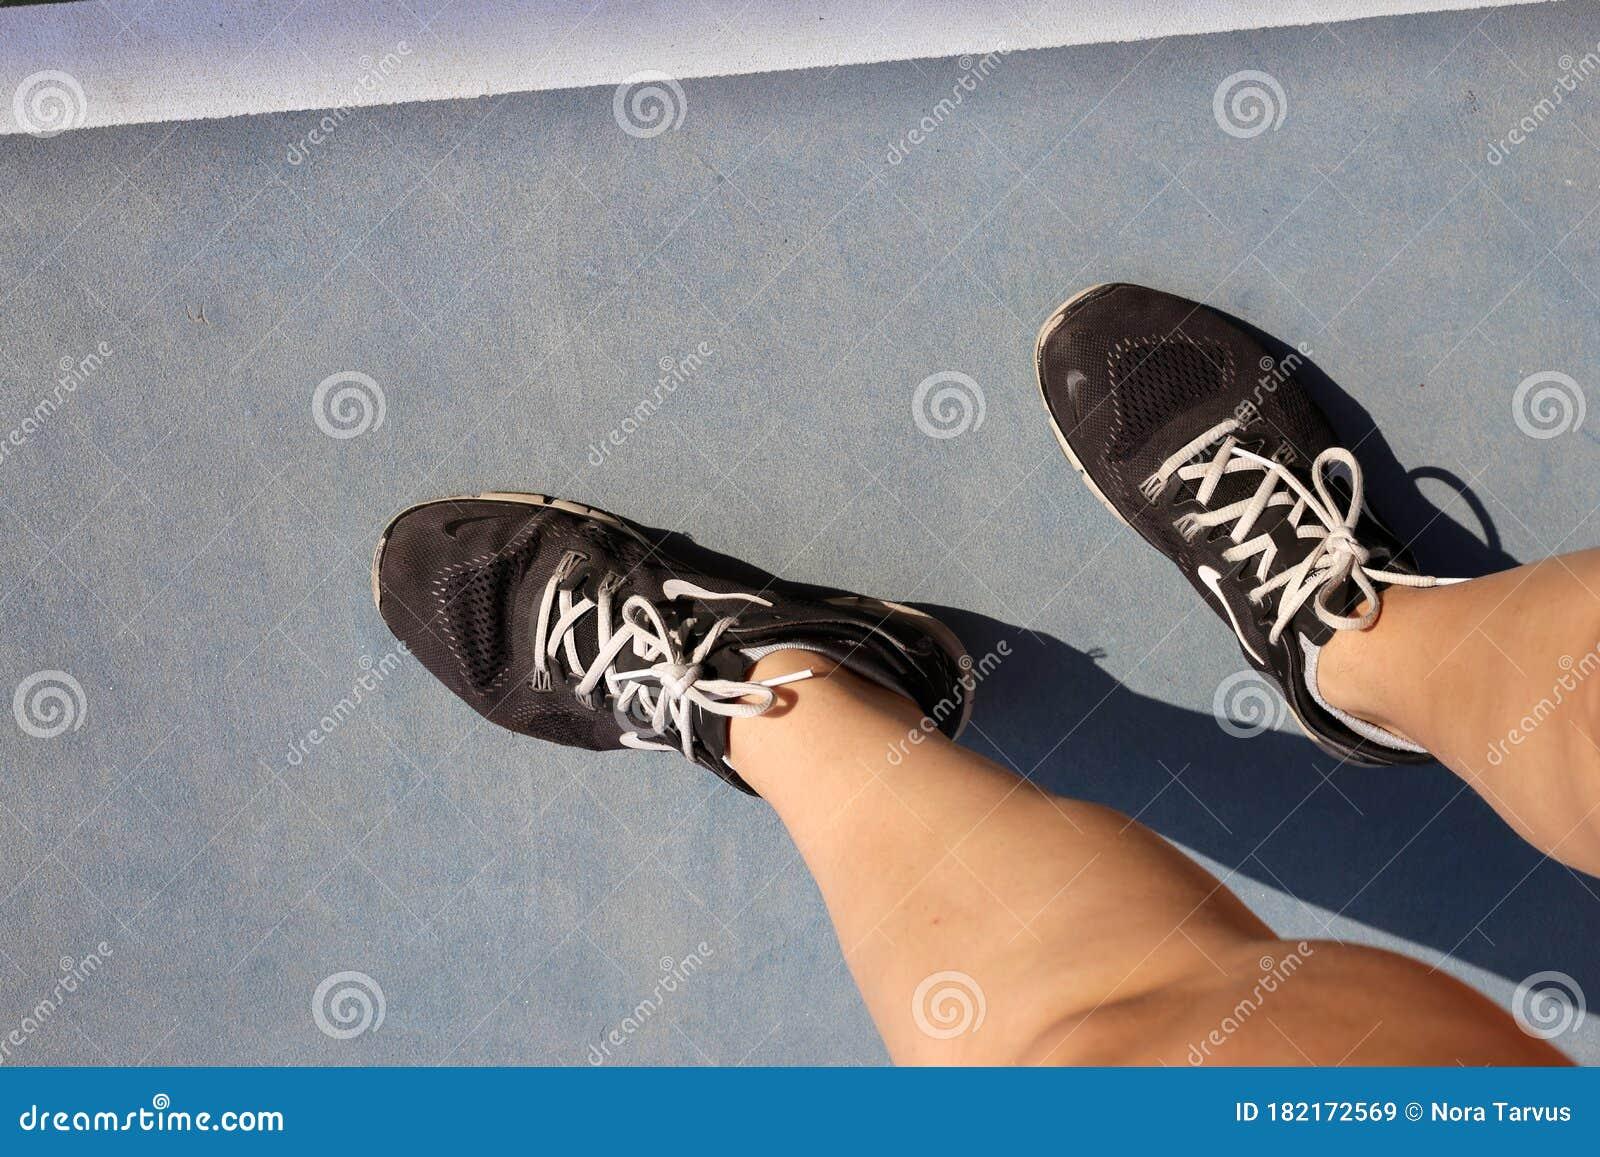 Capilares Reprimir Pesimista  Tennis Player`s Nike Shoes And Tennis Court In Dubai, UAE Editorial Stock  Image - Image of clothing, foot: 182172569